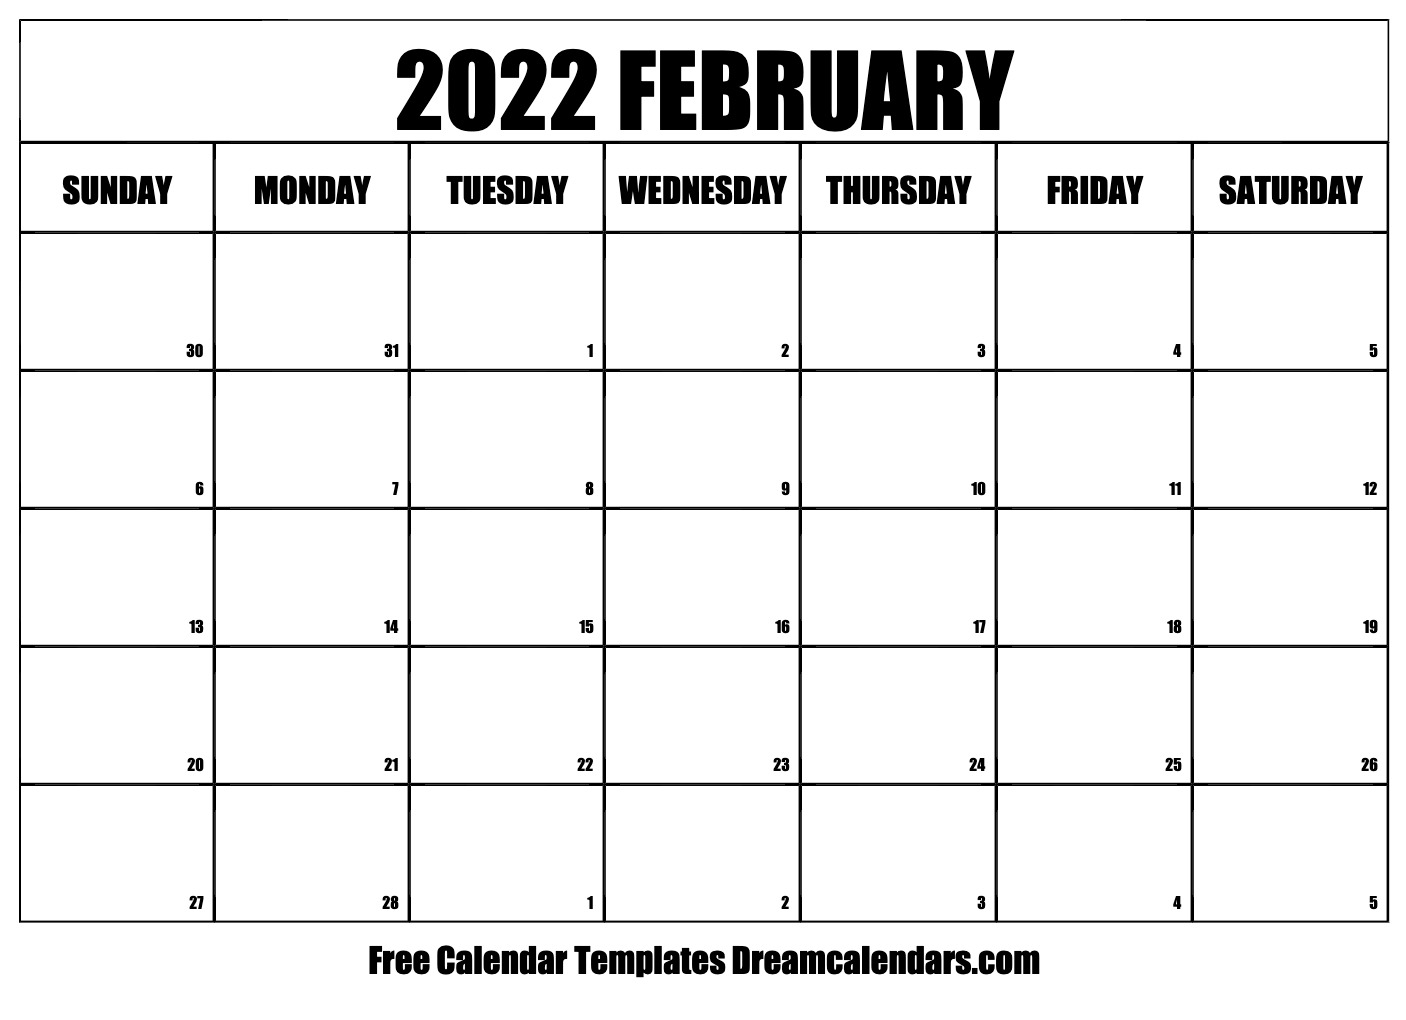 Goodwill Sales Calendar 2022.February 2022 Calendar Free Blank Printable Templates